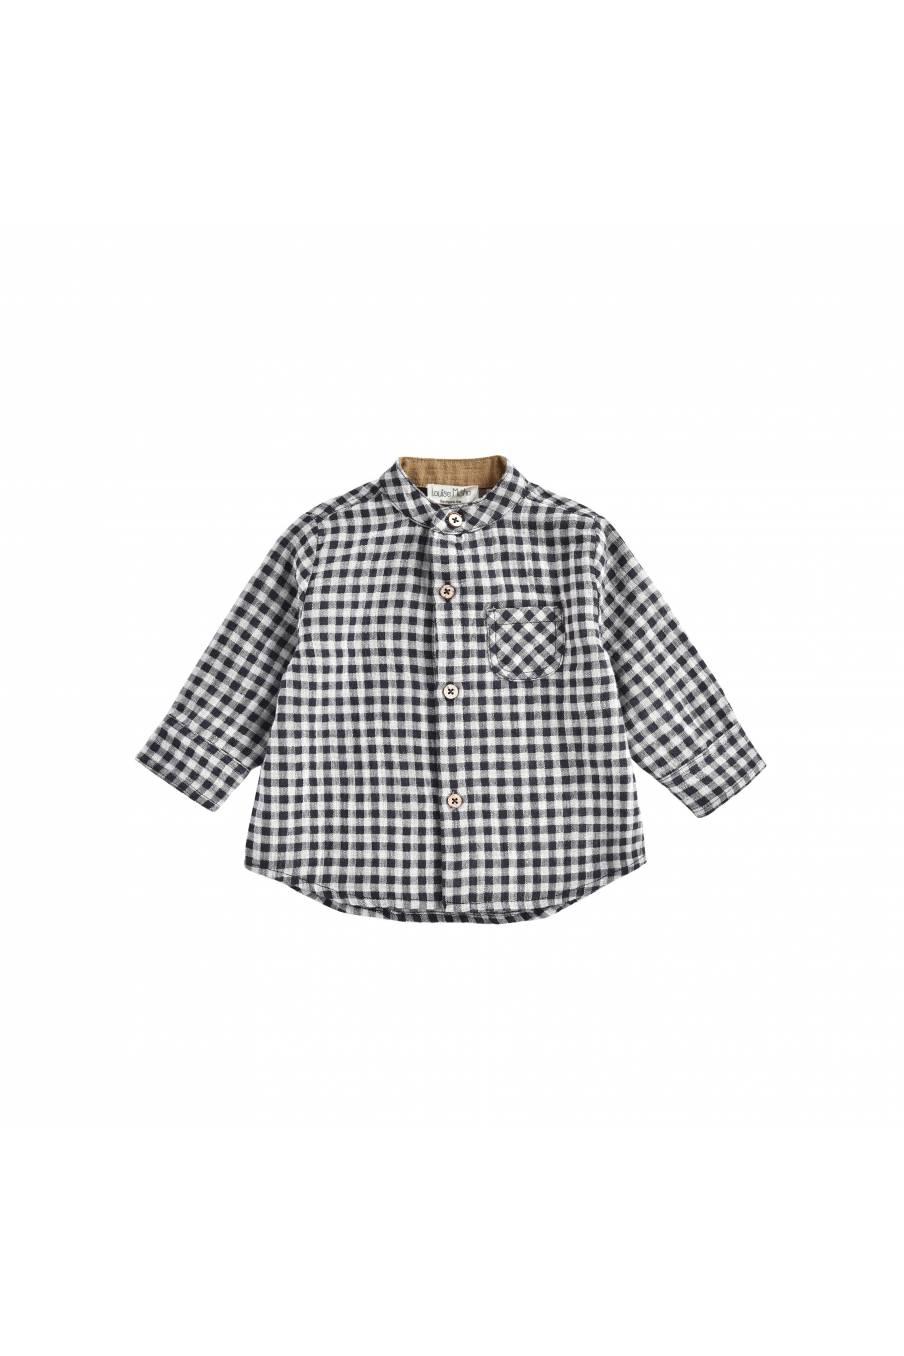 boheme chic vintage chemise bébé garcon akir black vichy